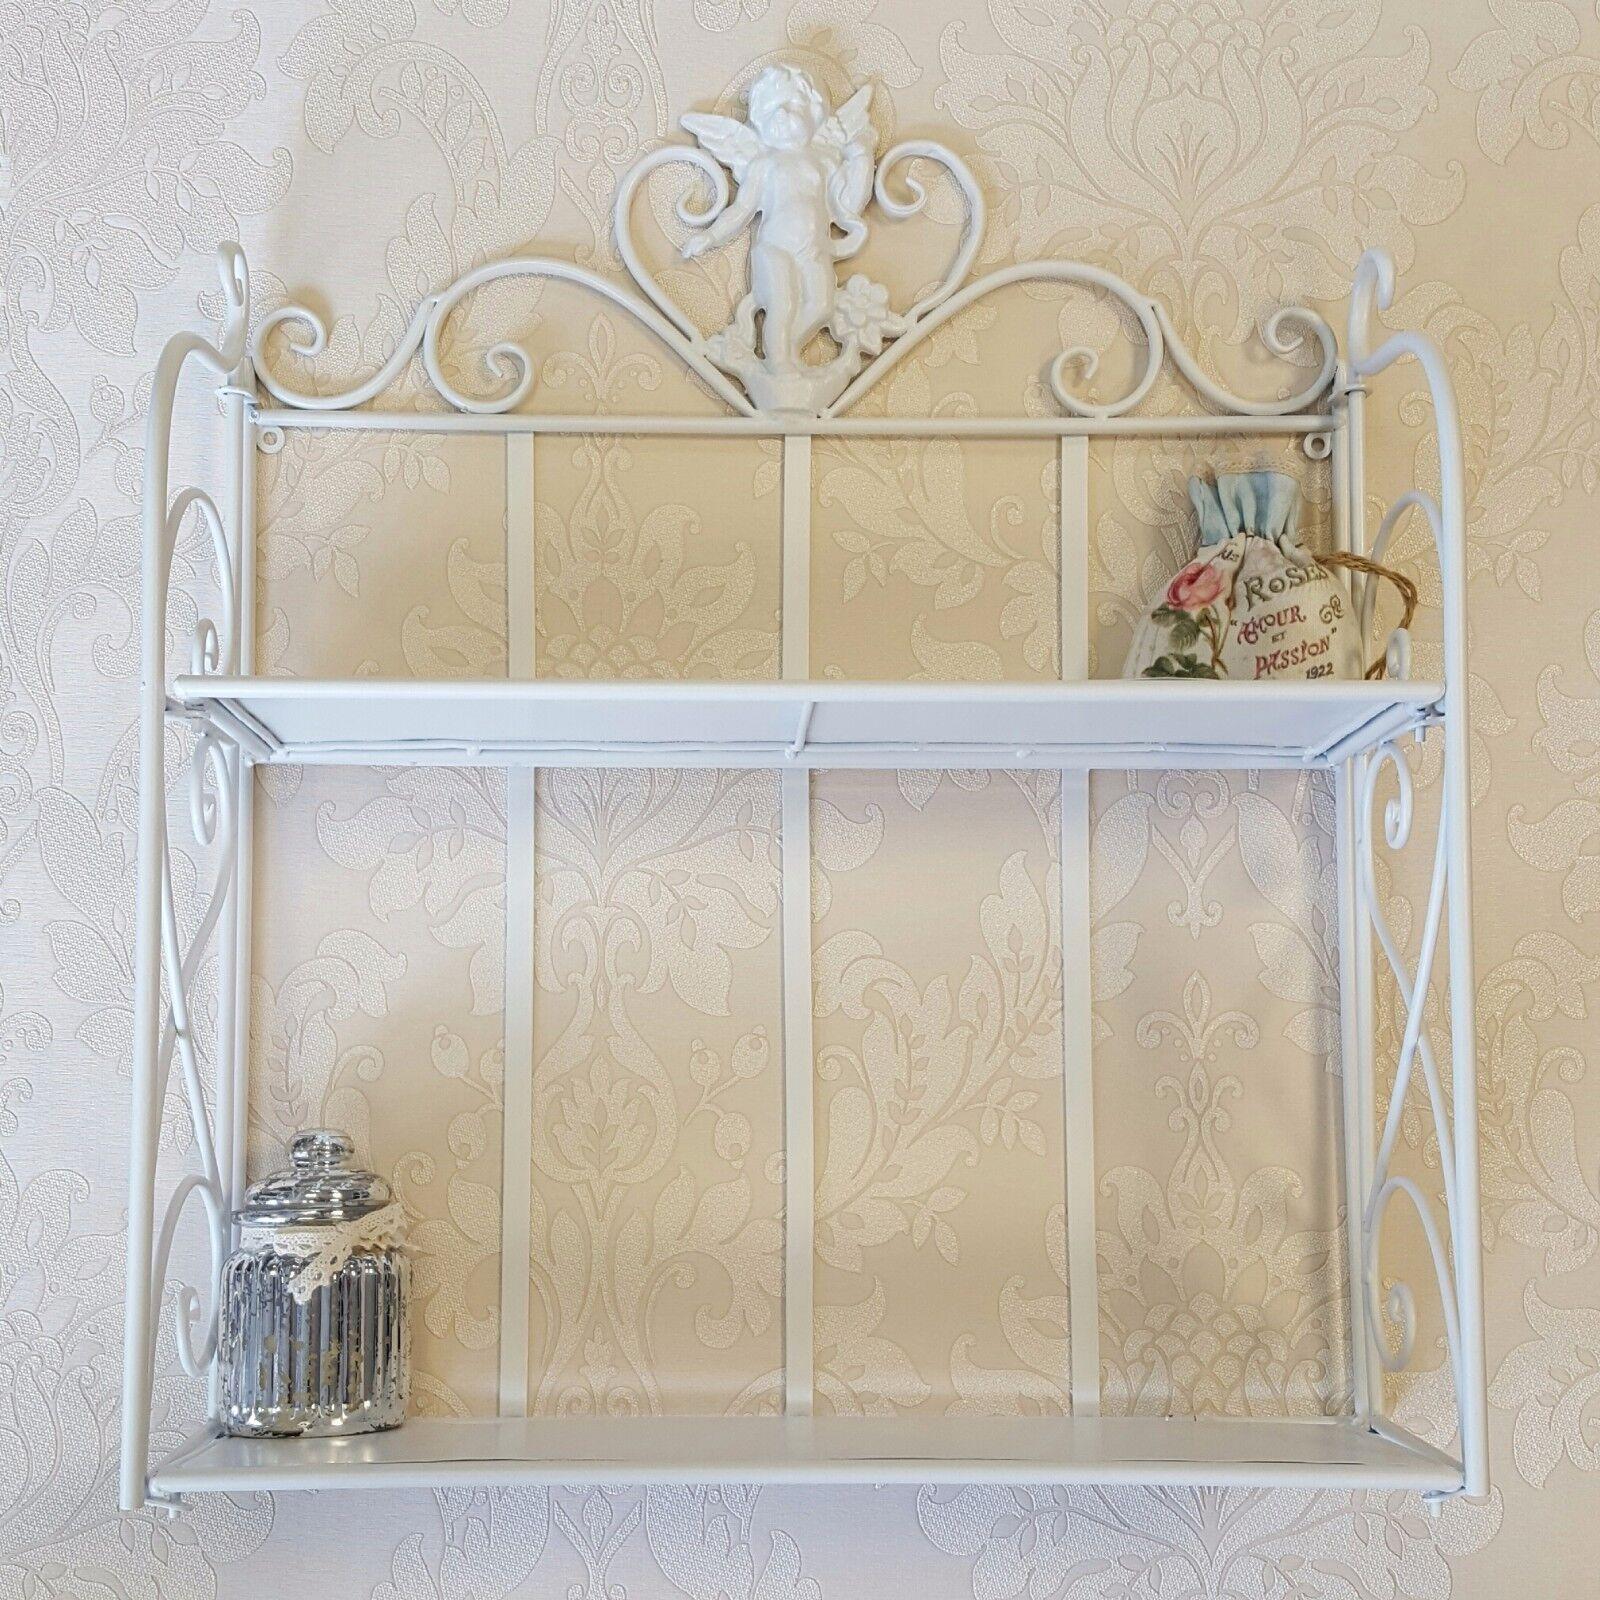 shabby chic shelves vintage wall shelf storage display. Black Bedroom Furniture Sets. Home Design Ideas